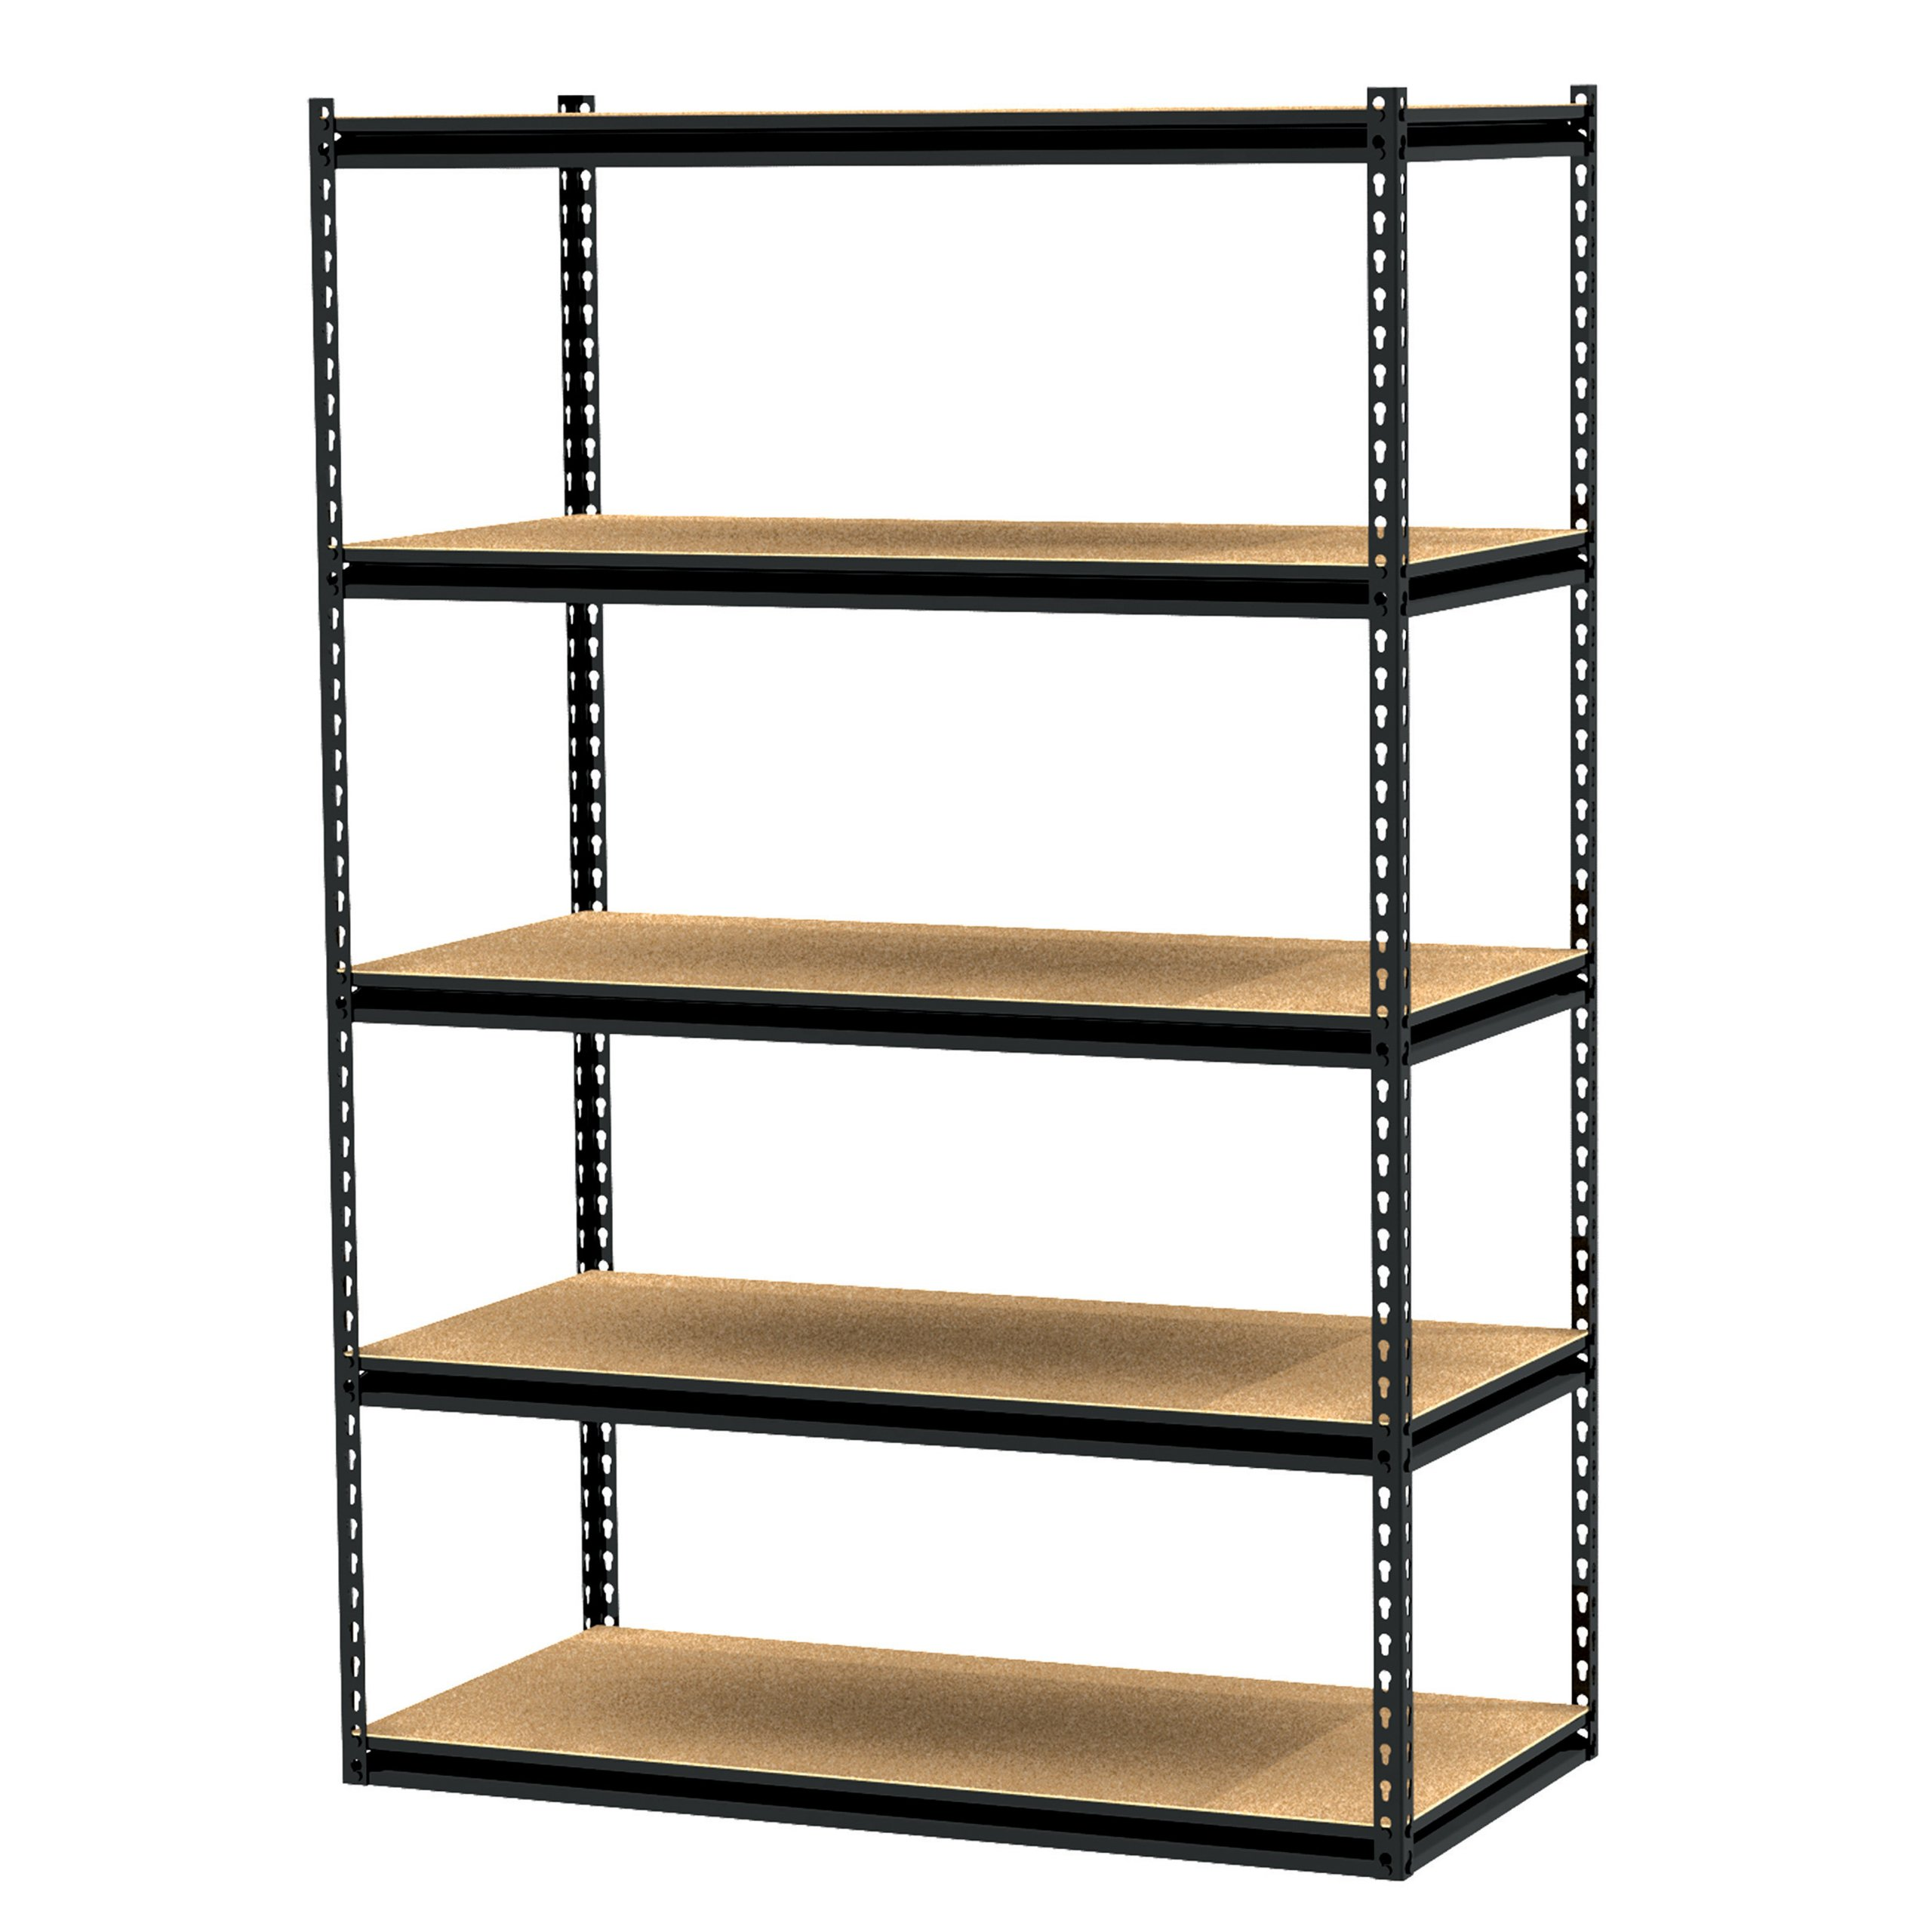 Gorilla Rack GRZ6-4824-5PCB 48 by 24 by 72-Inch Shelving Unit with 5-shelf, Black by Gorilla Rack